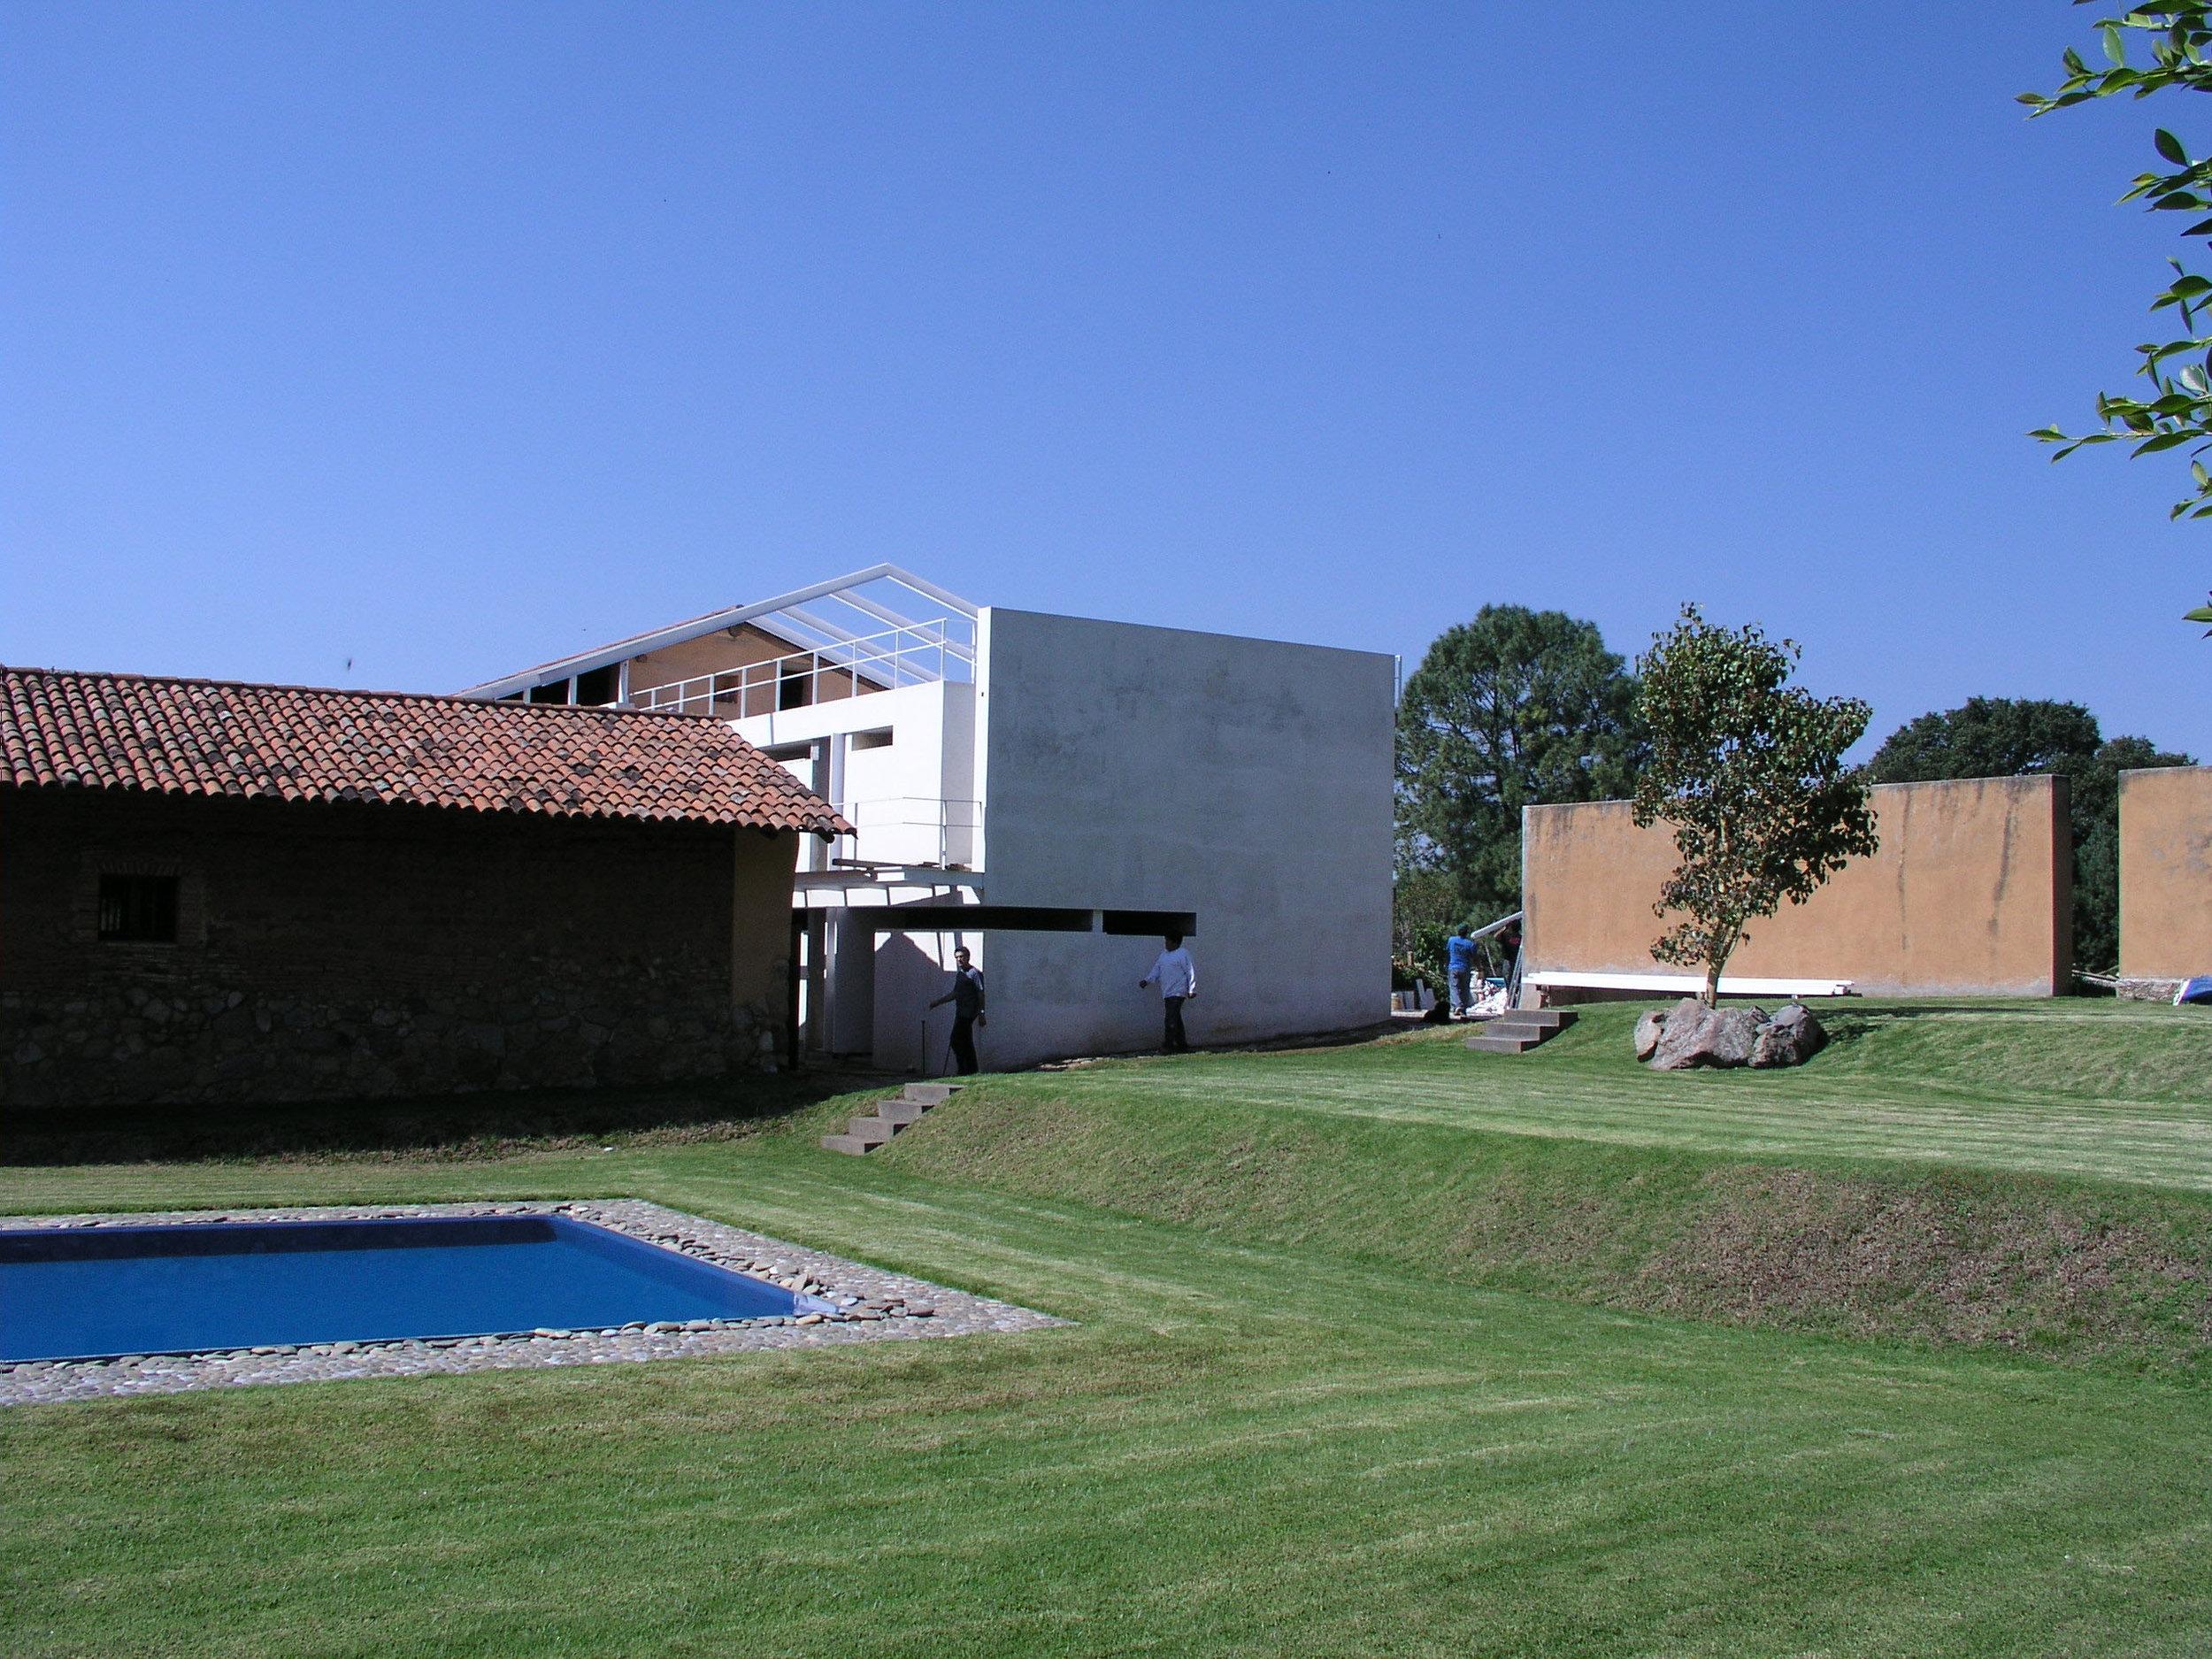 Casa SB - San Gabriel, México